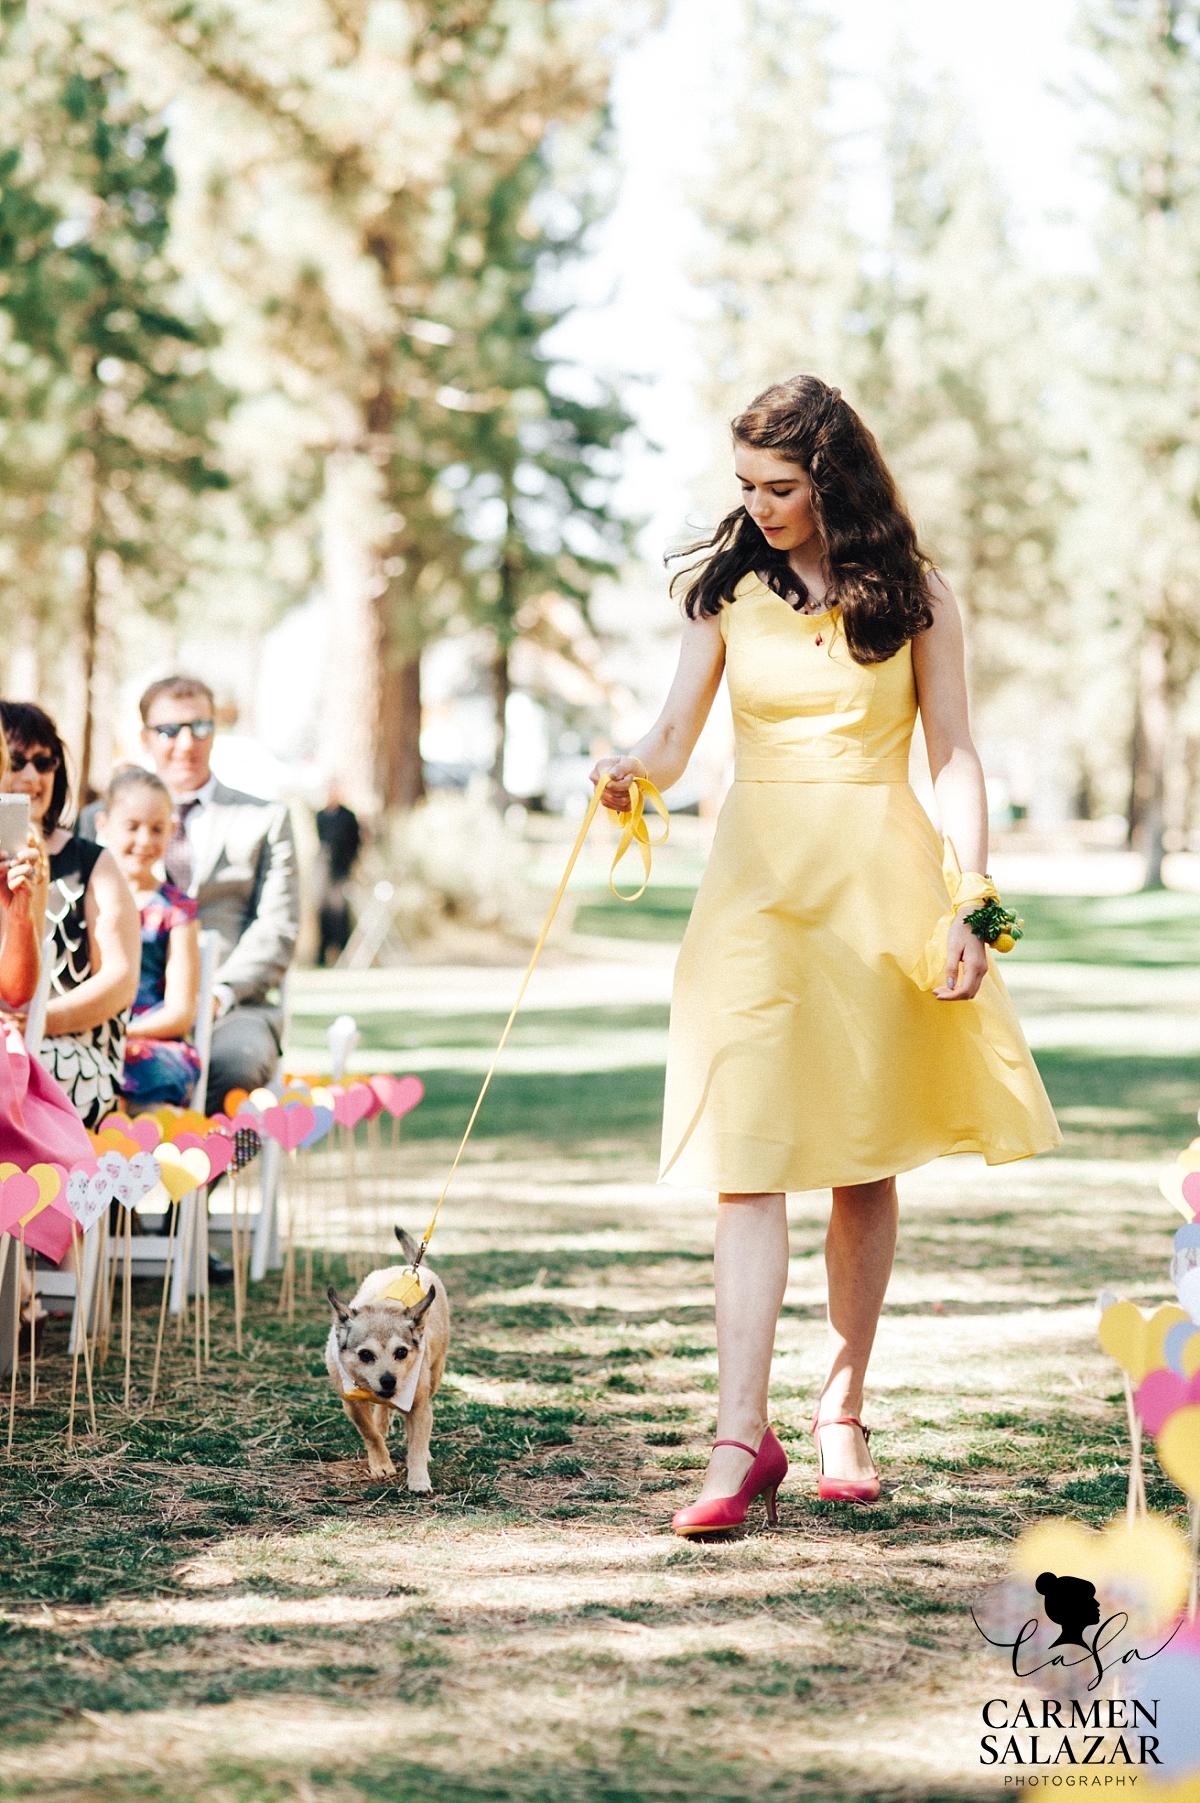 Bright junior bridesmaid walking dog down wedding aisle - Carmen Salazar